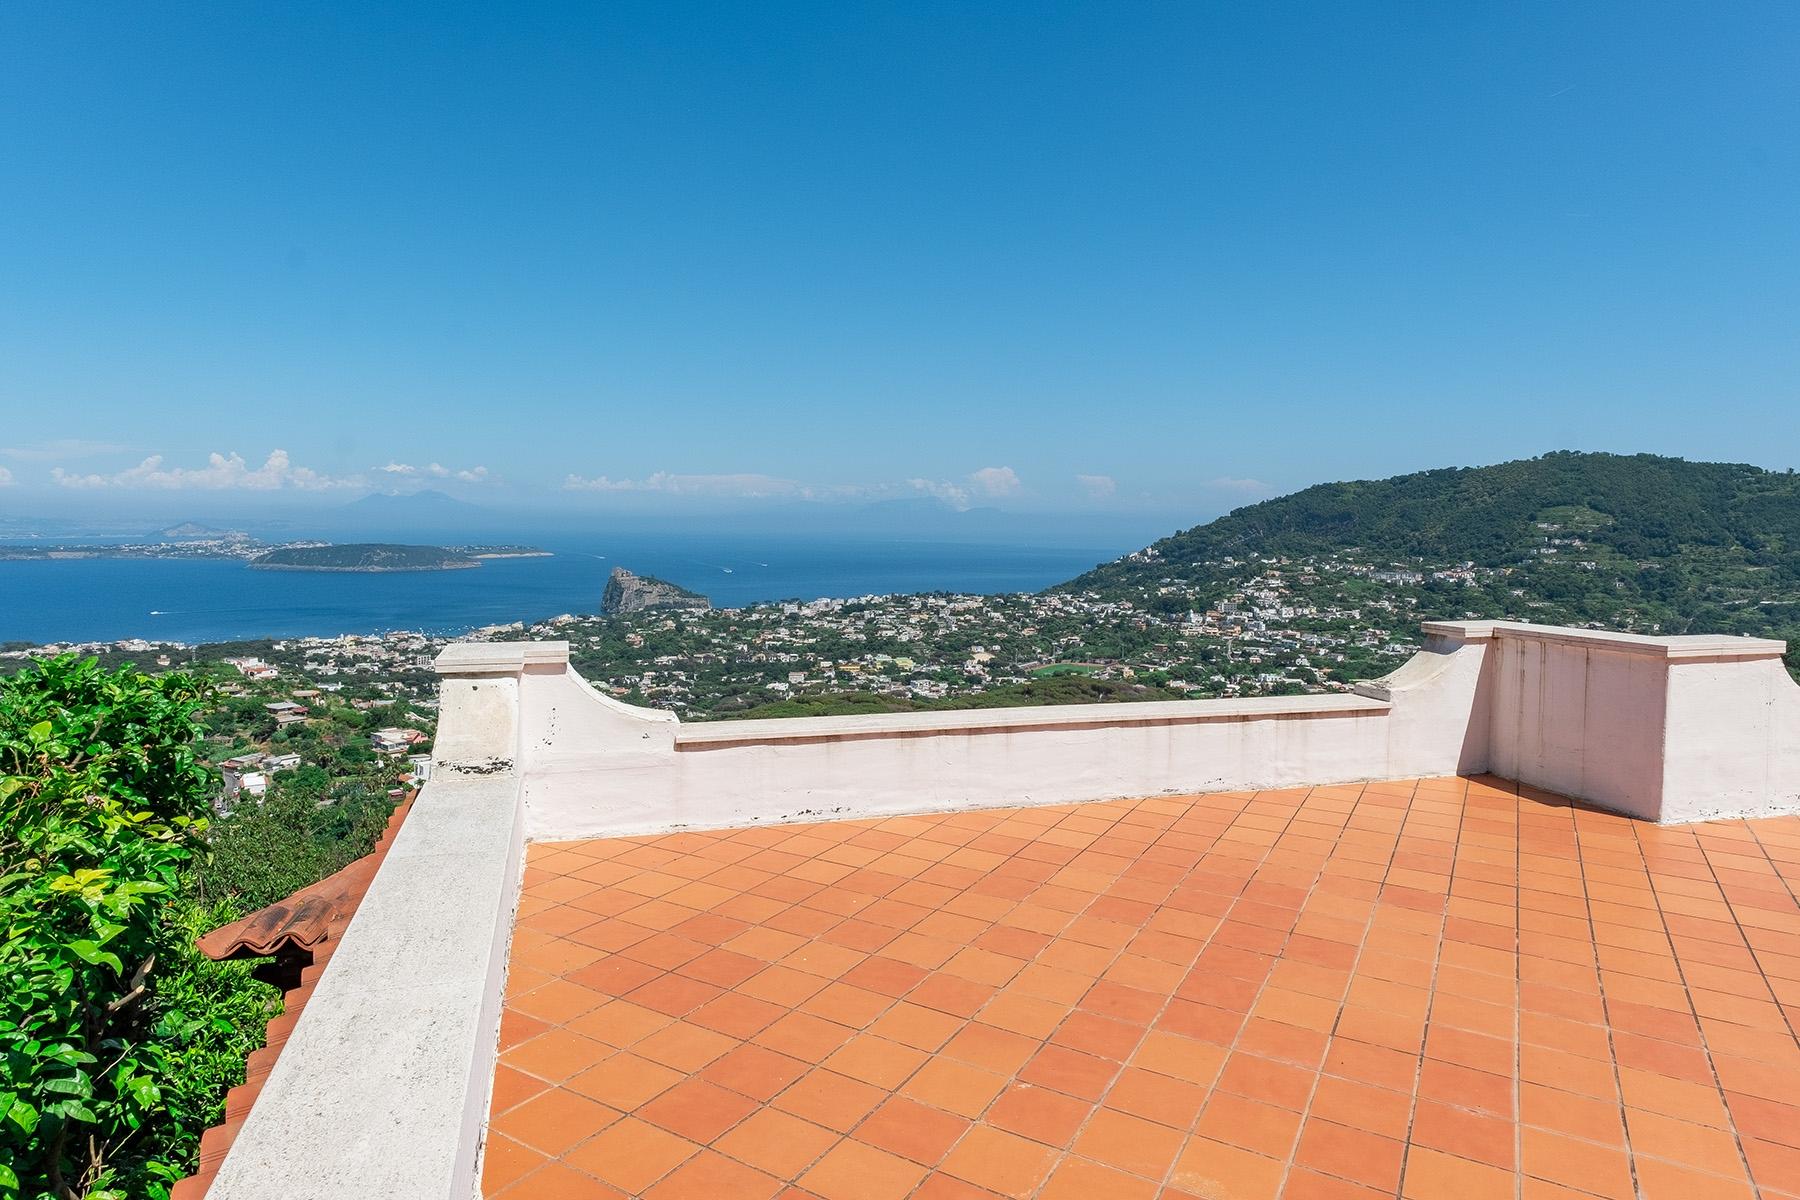 Villa in Vendita a Ischia: 5 locali, 138 mq - Foto 13